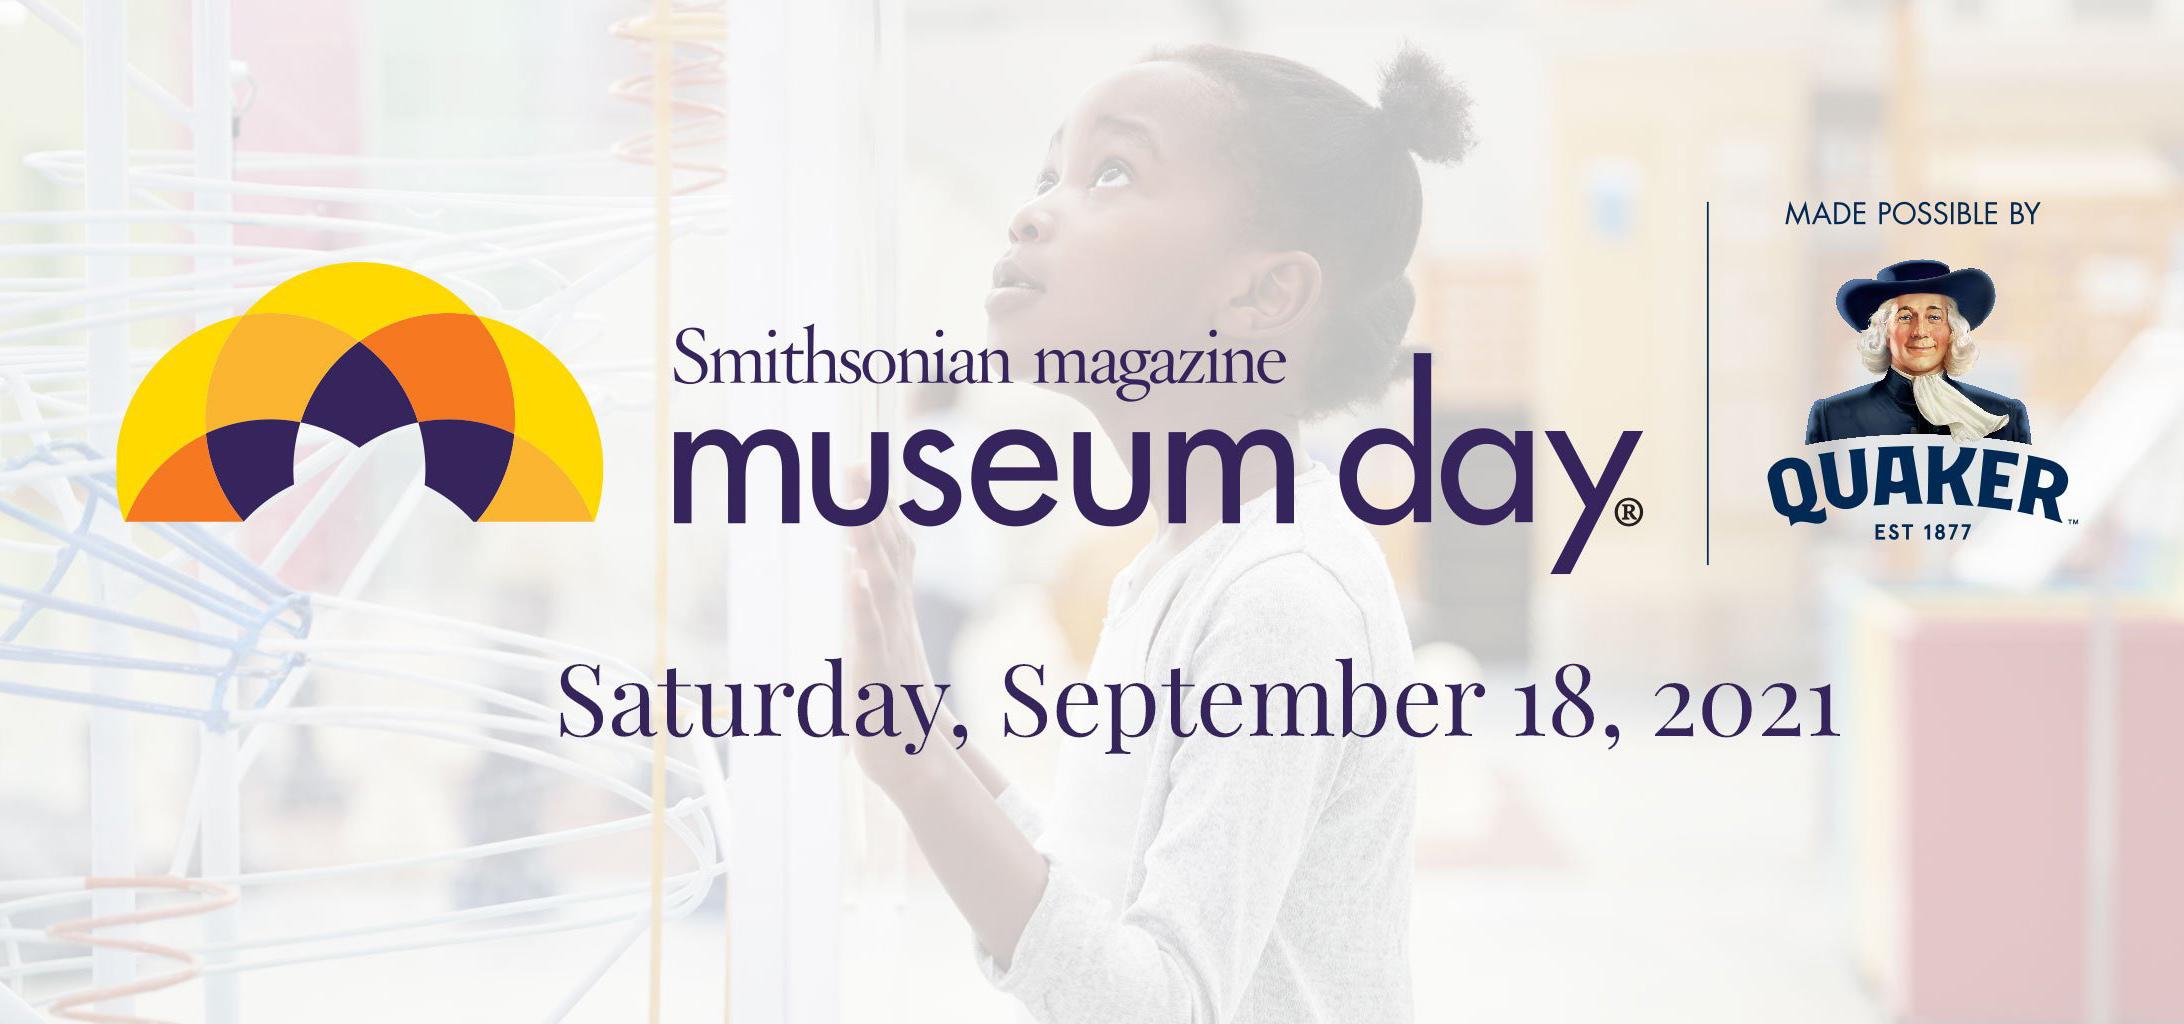 Smithsonian Magazine Museum Day logo with dates